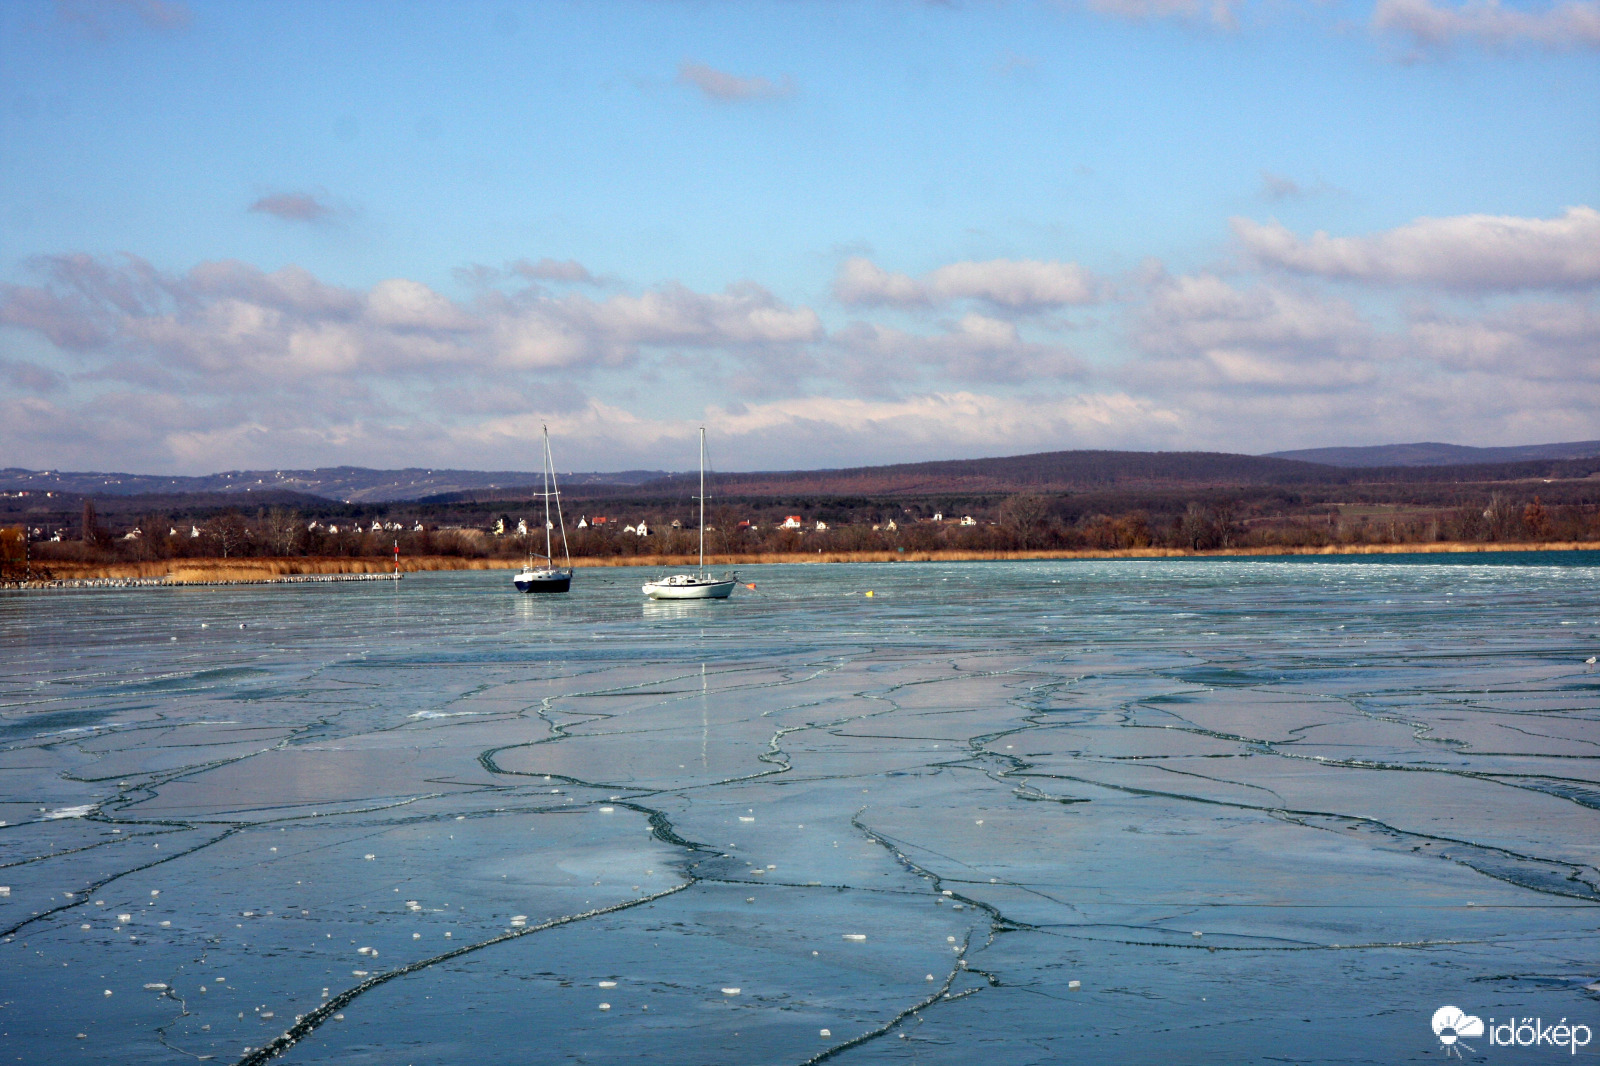 Képeken a hétvége balatoni jégformái